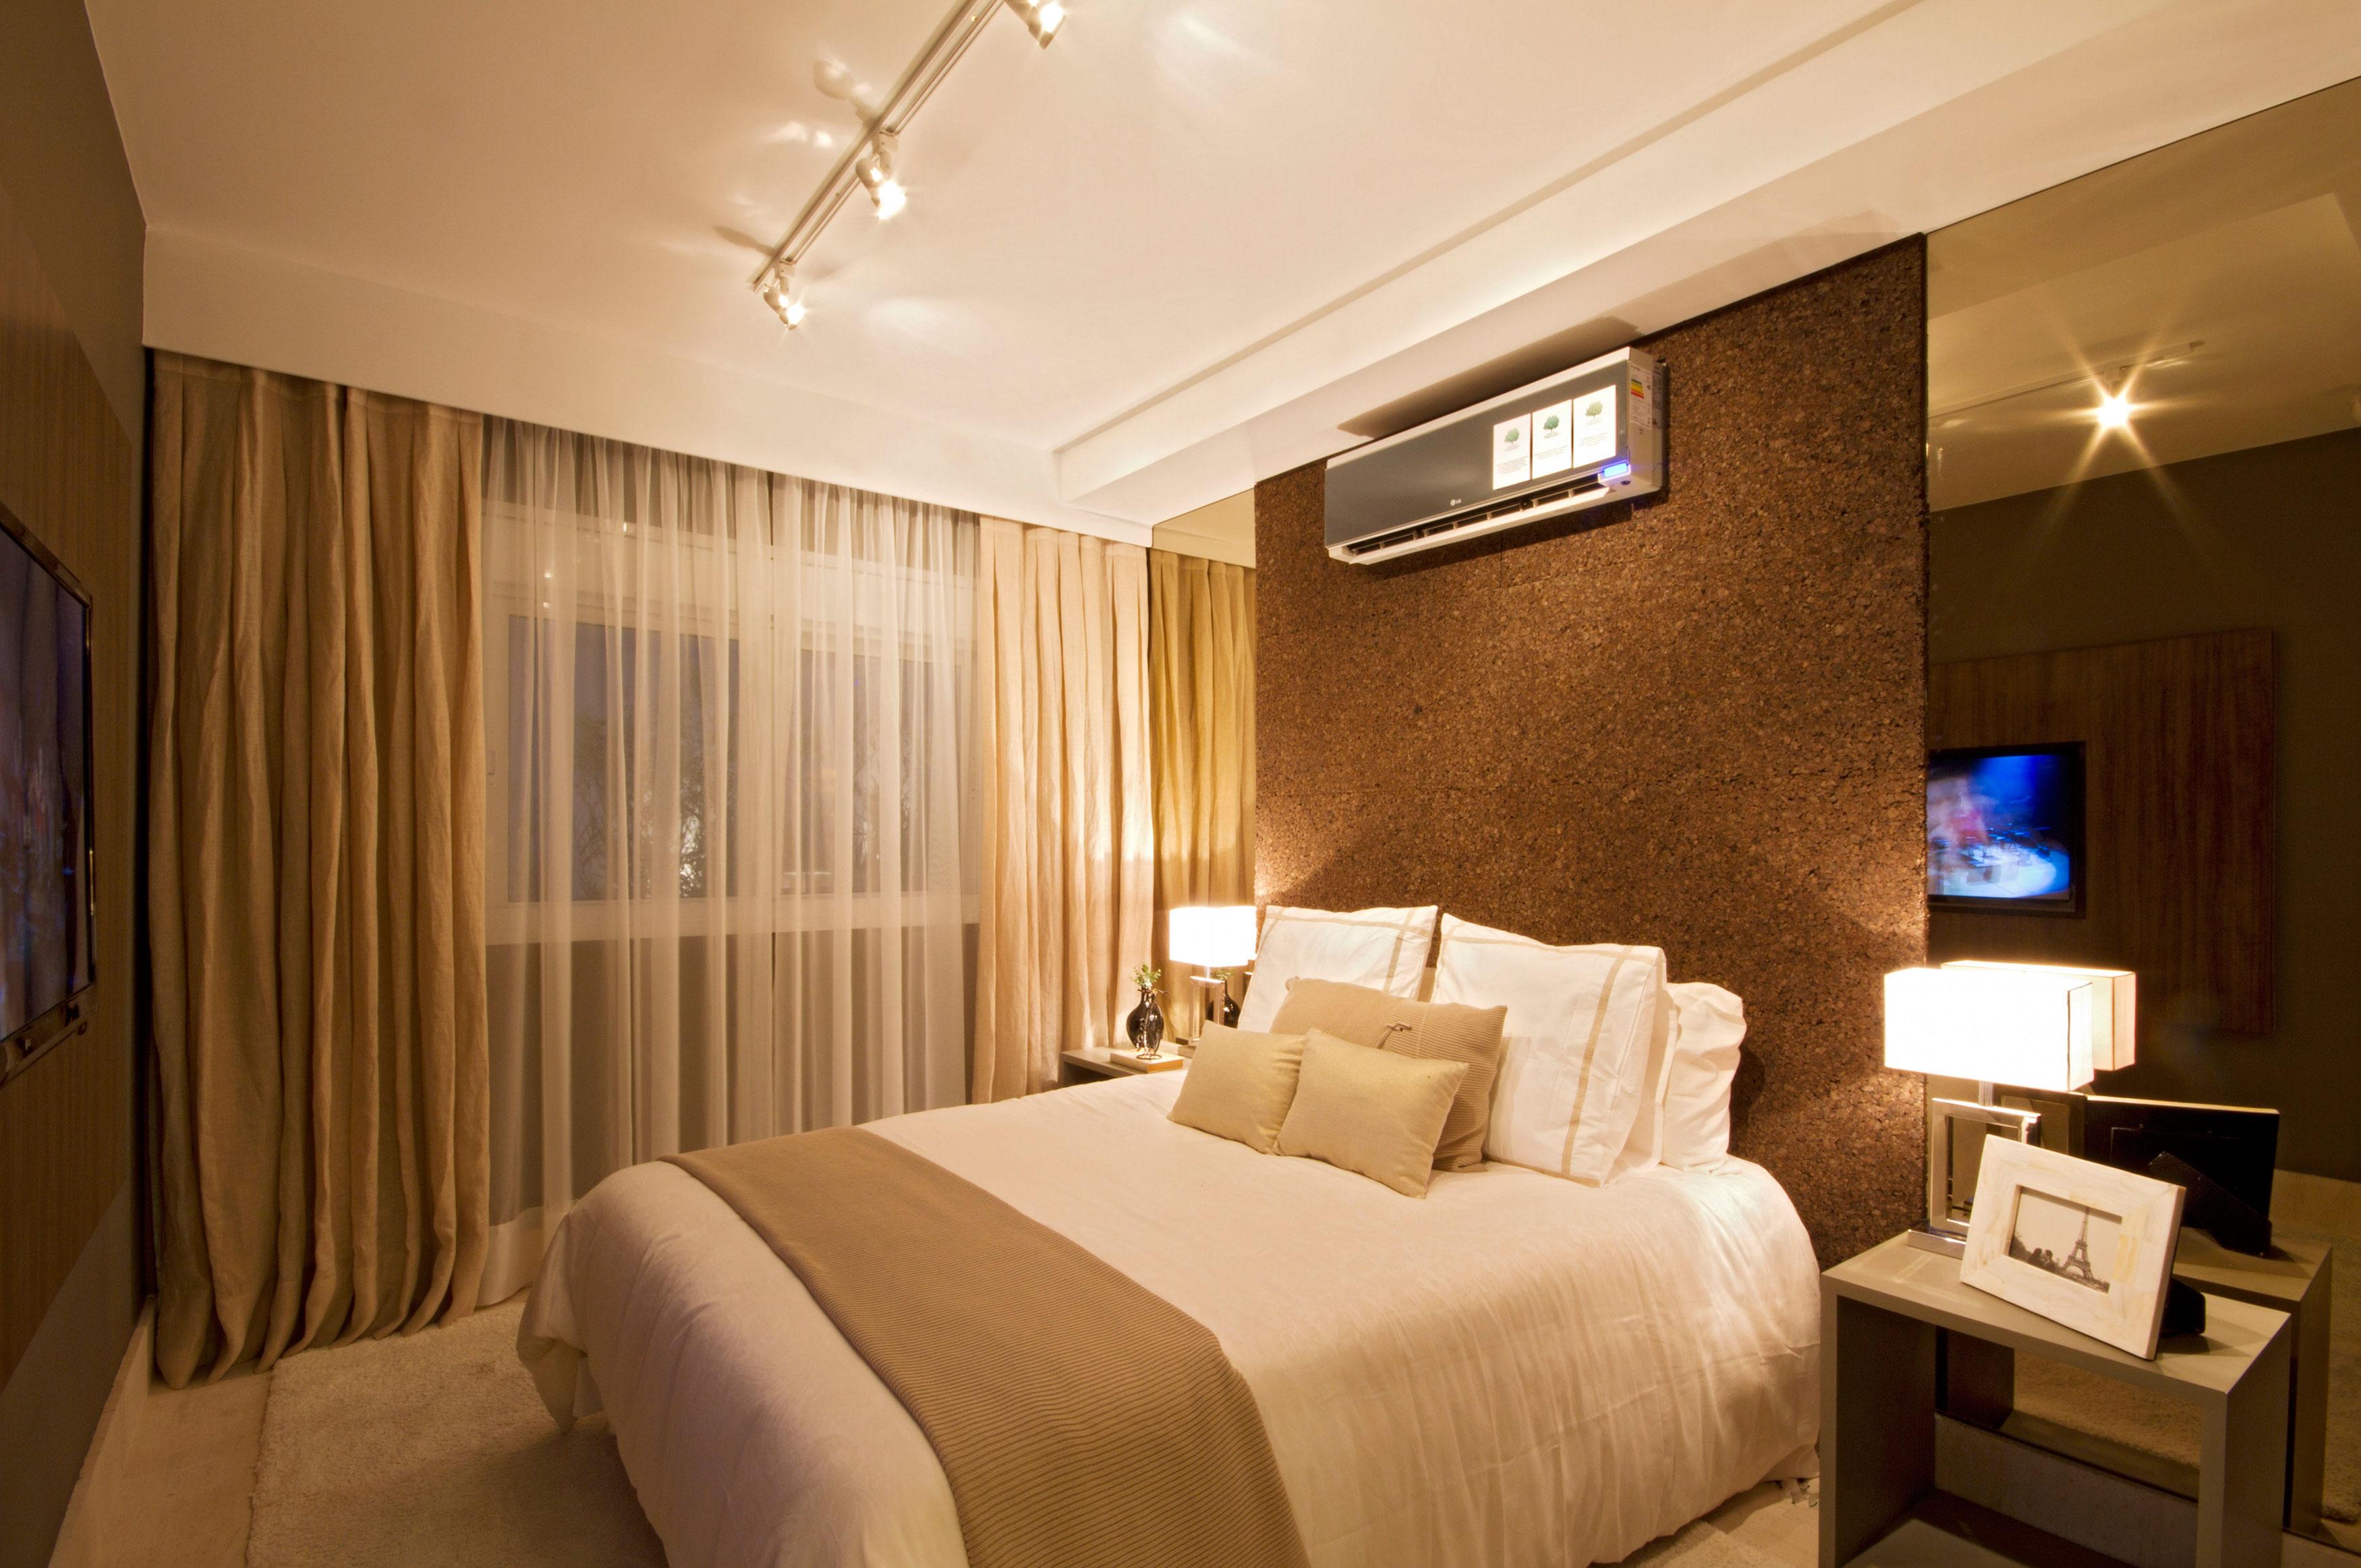 79 m² - Suíte do casal